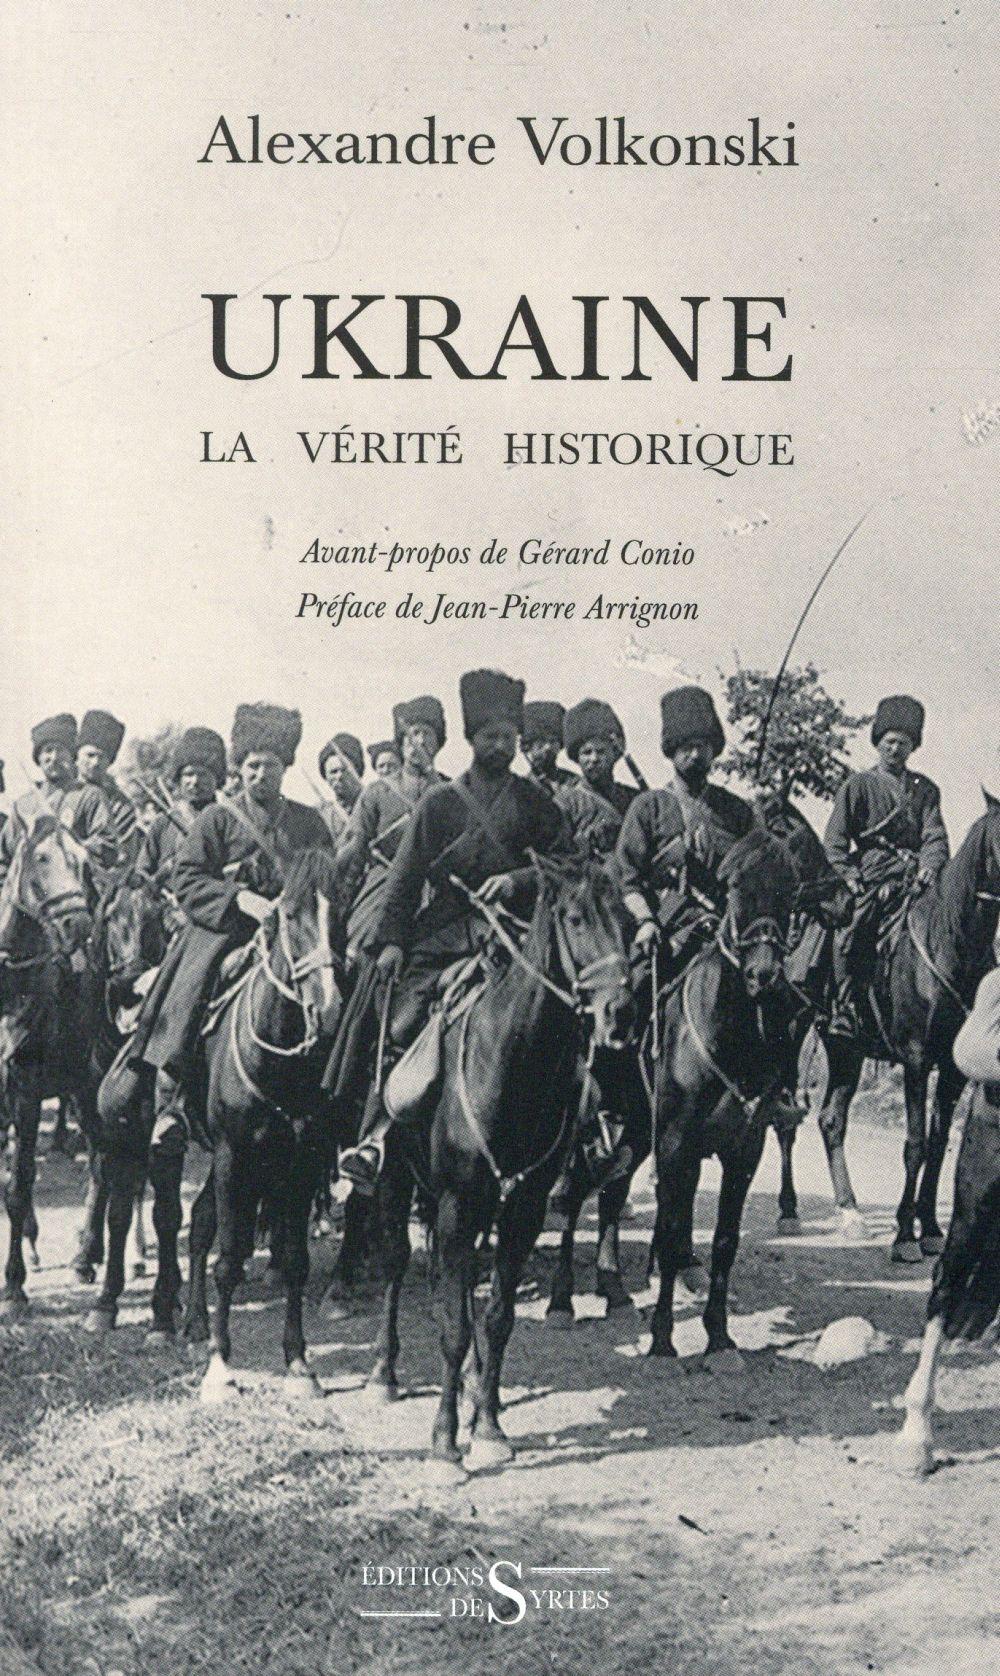 UKRAINE LA VERITE HISTORIQUE